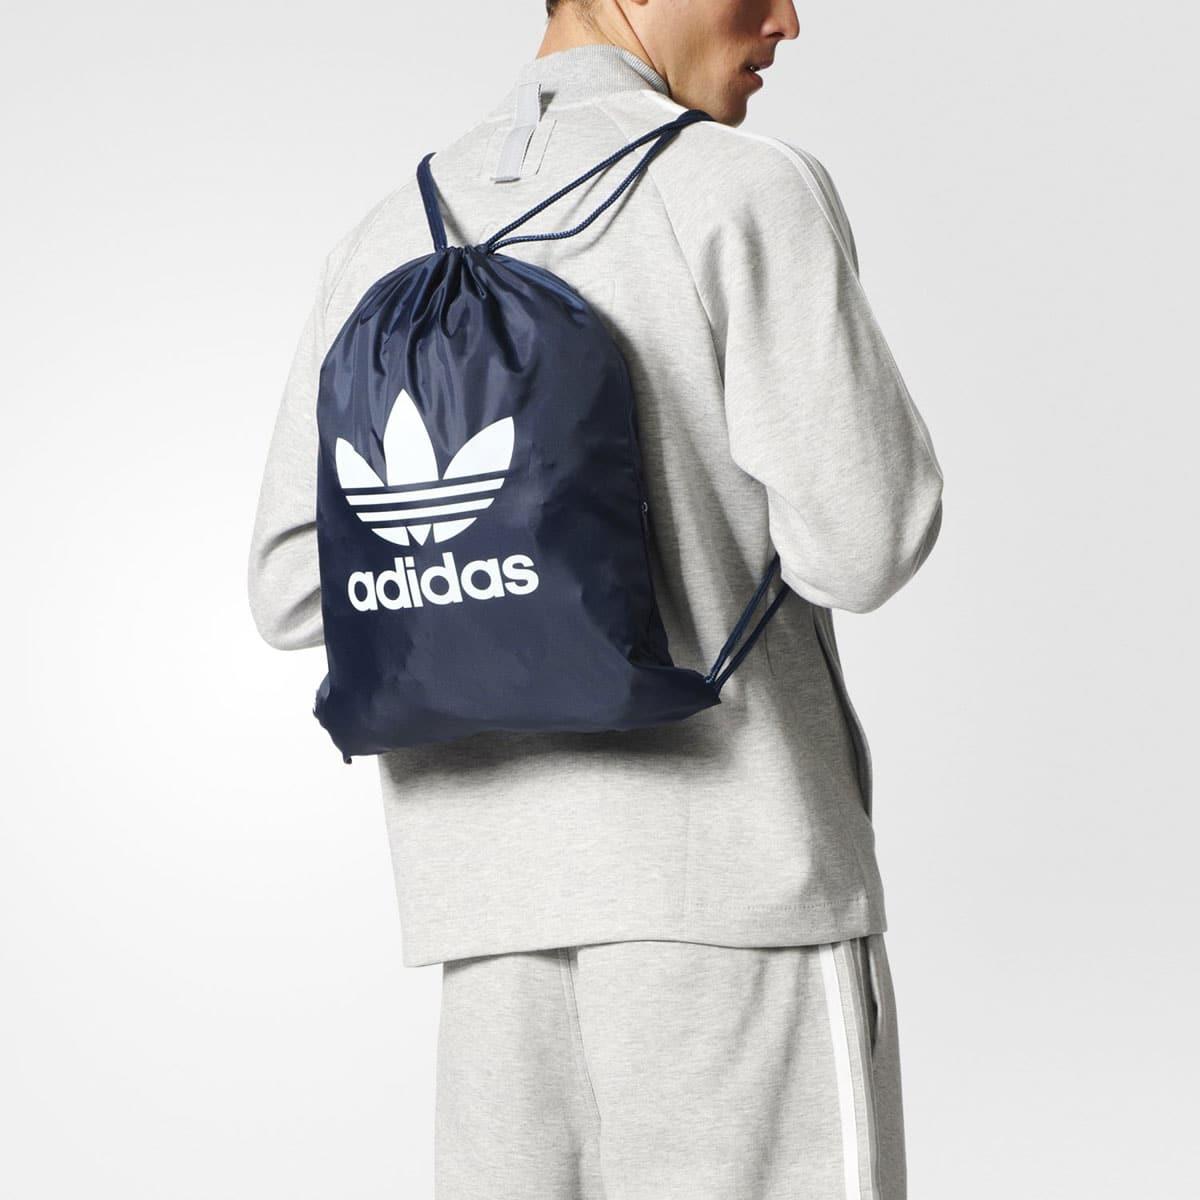 """adidas Originals GYMSACK TREFOIL  COLLEGE NAVY""_photo_3"